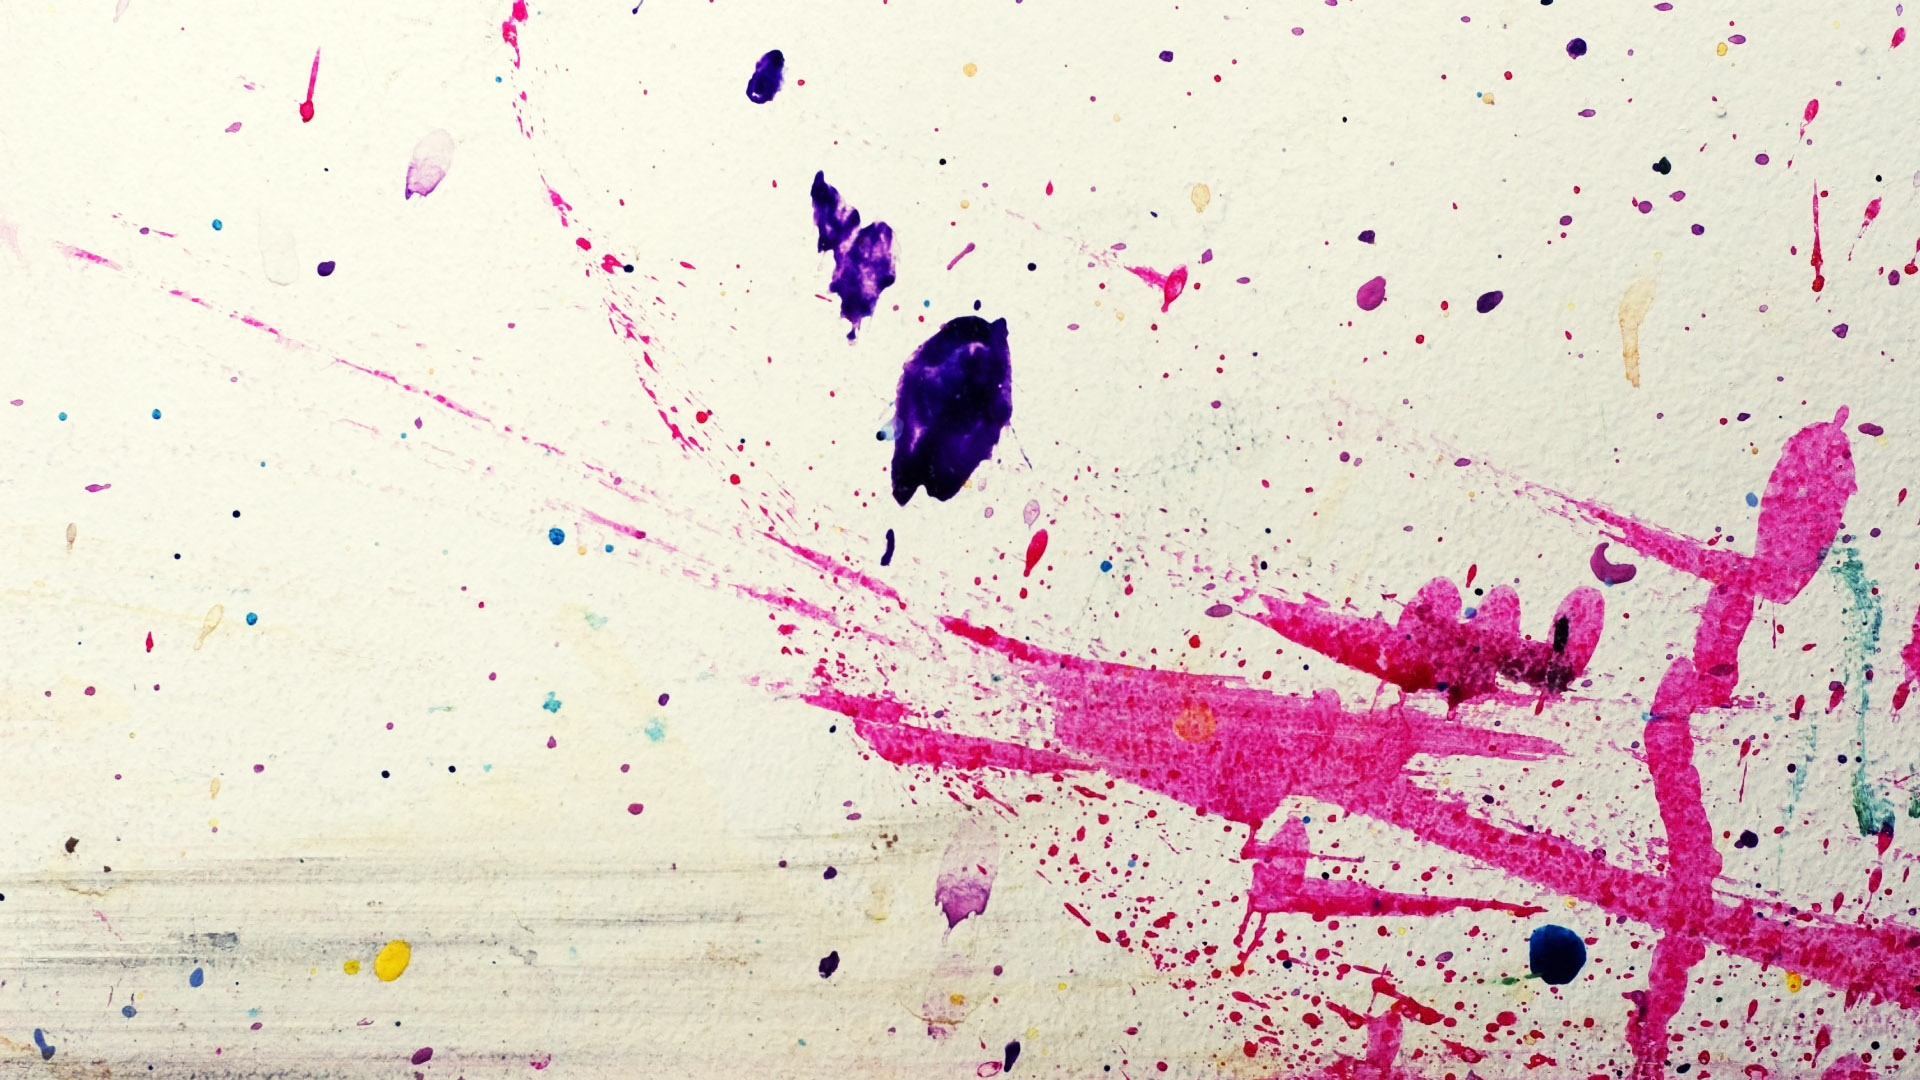 paint splatter wallpapers wallpaper cave. splatter paint